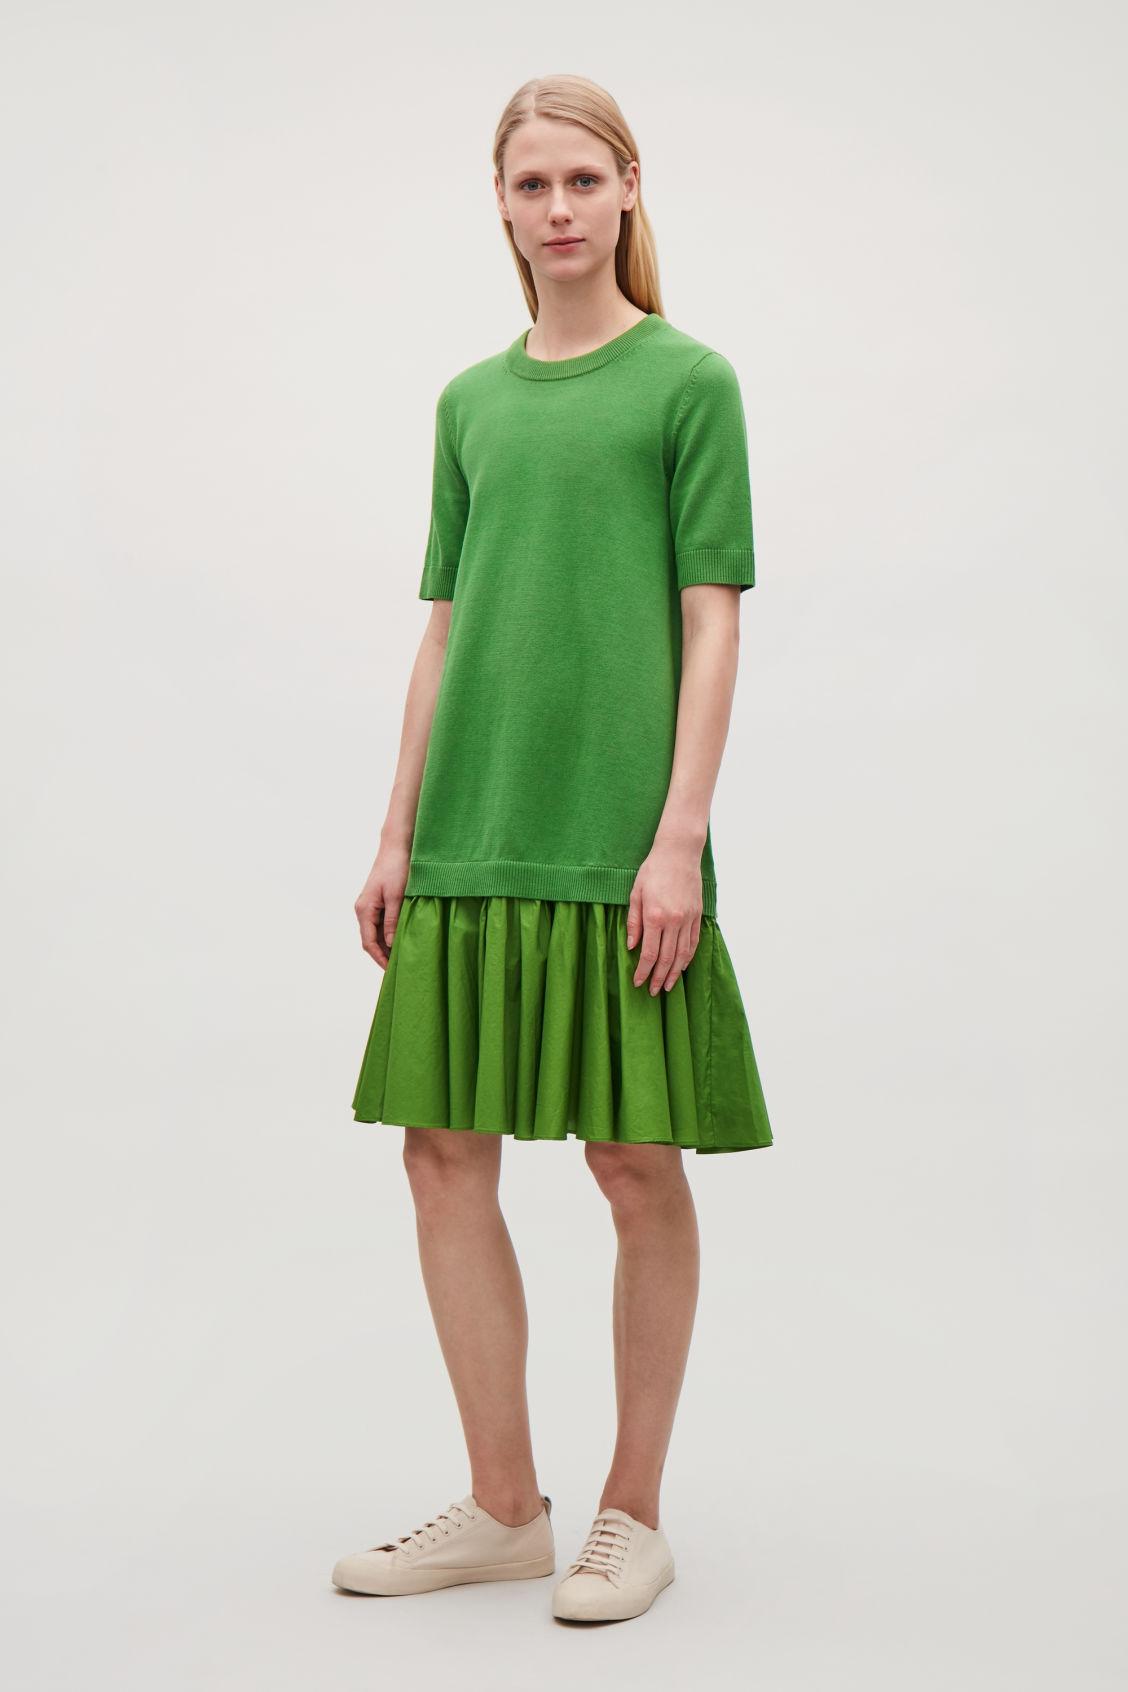 Cos PANELLED COTTON KNIT DRESS